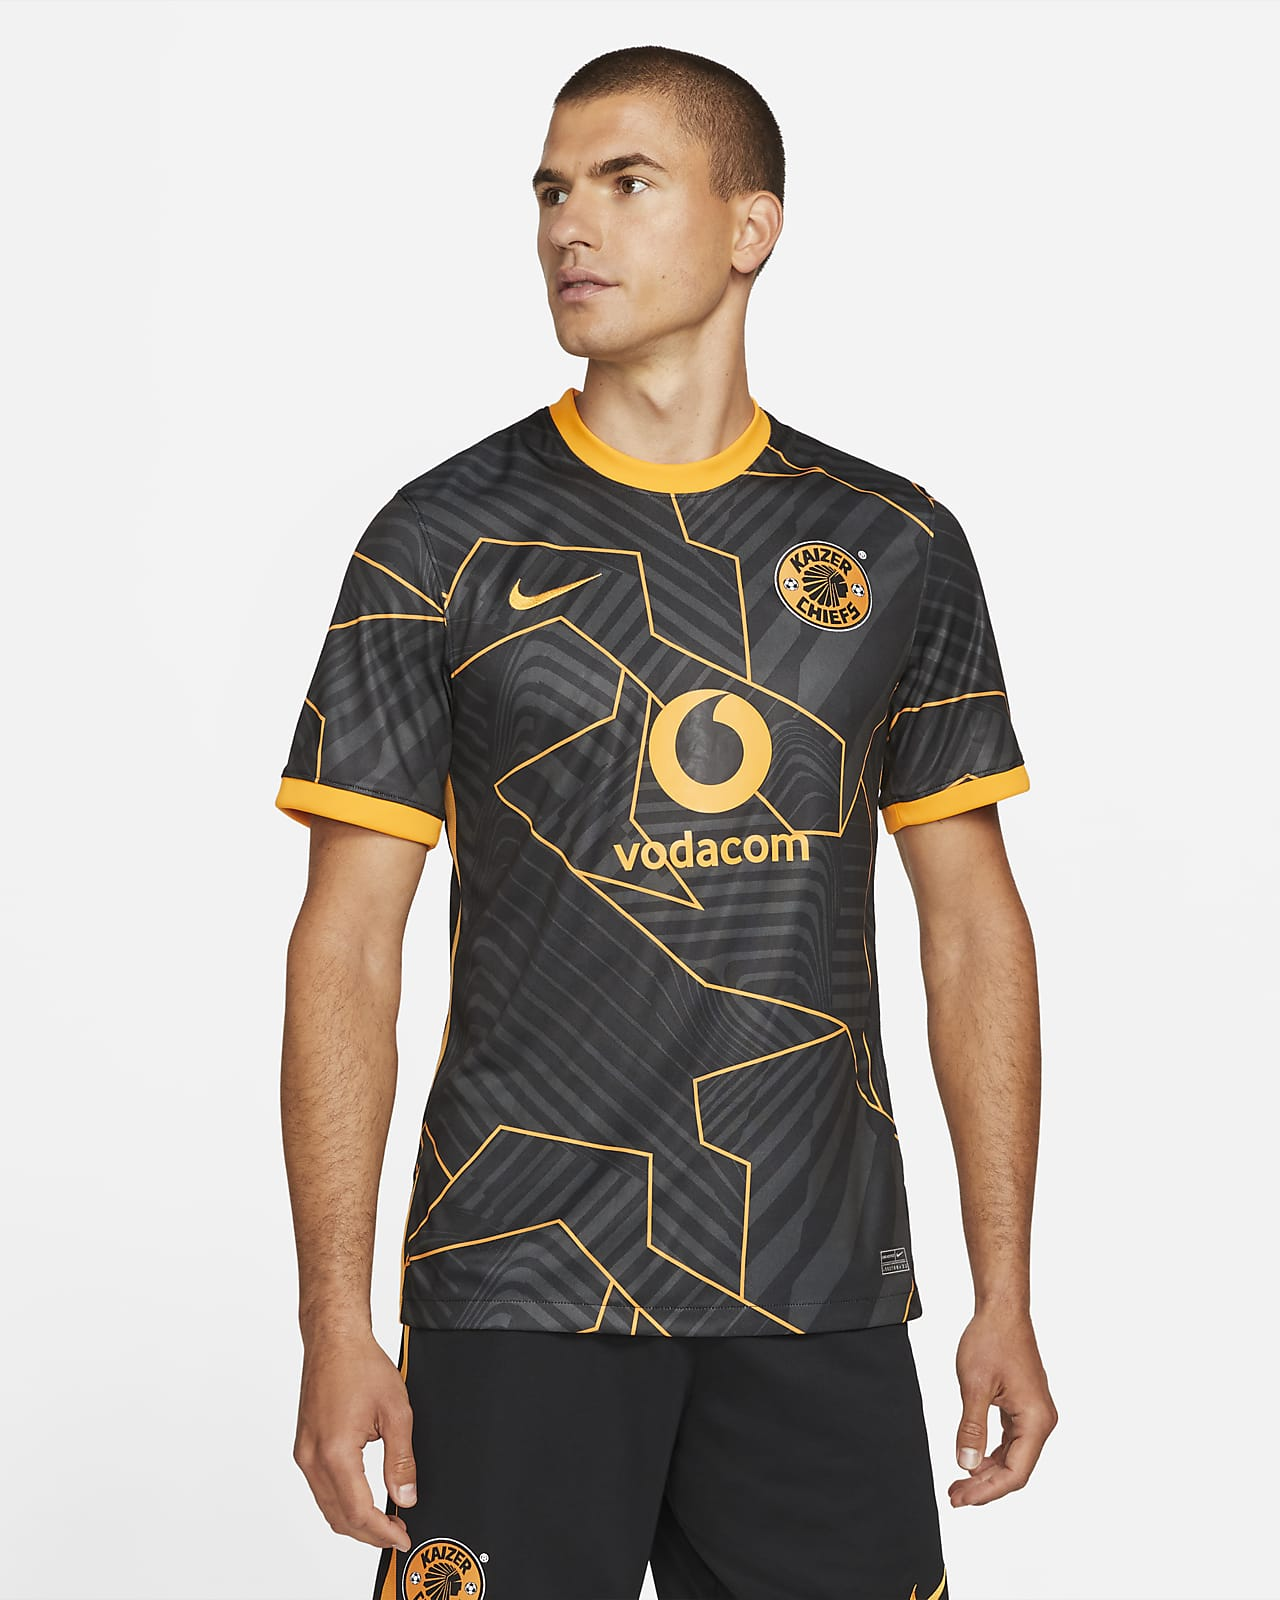 Kaizer Chiefs F.C. 2021/22 Stadium Away Men's Nike Dri-FIT Football Shirt